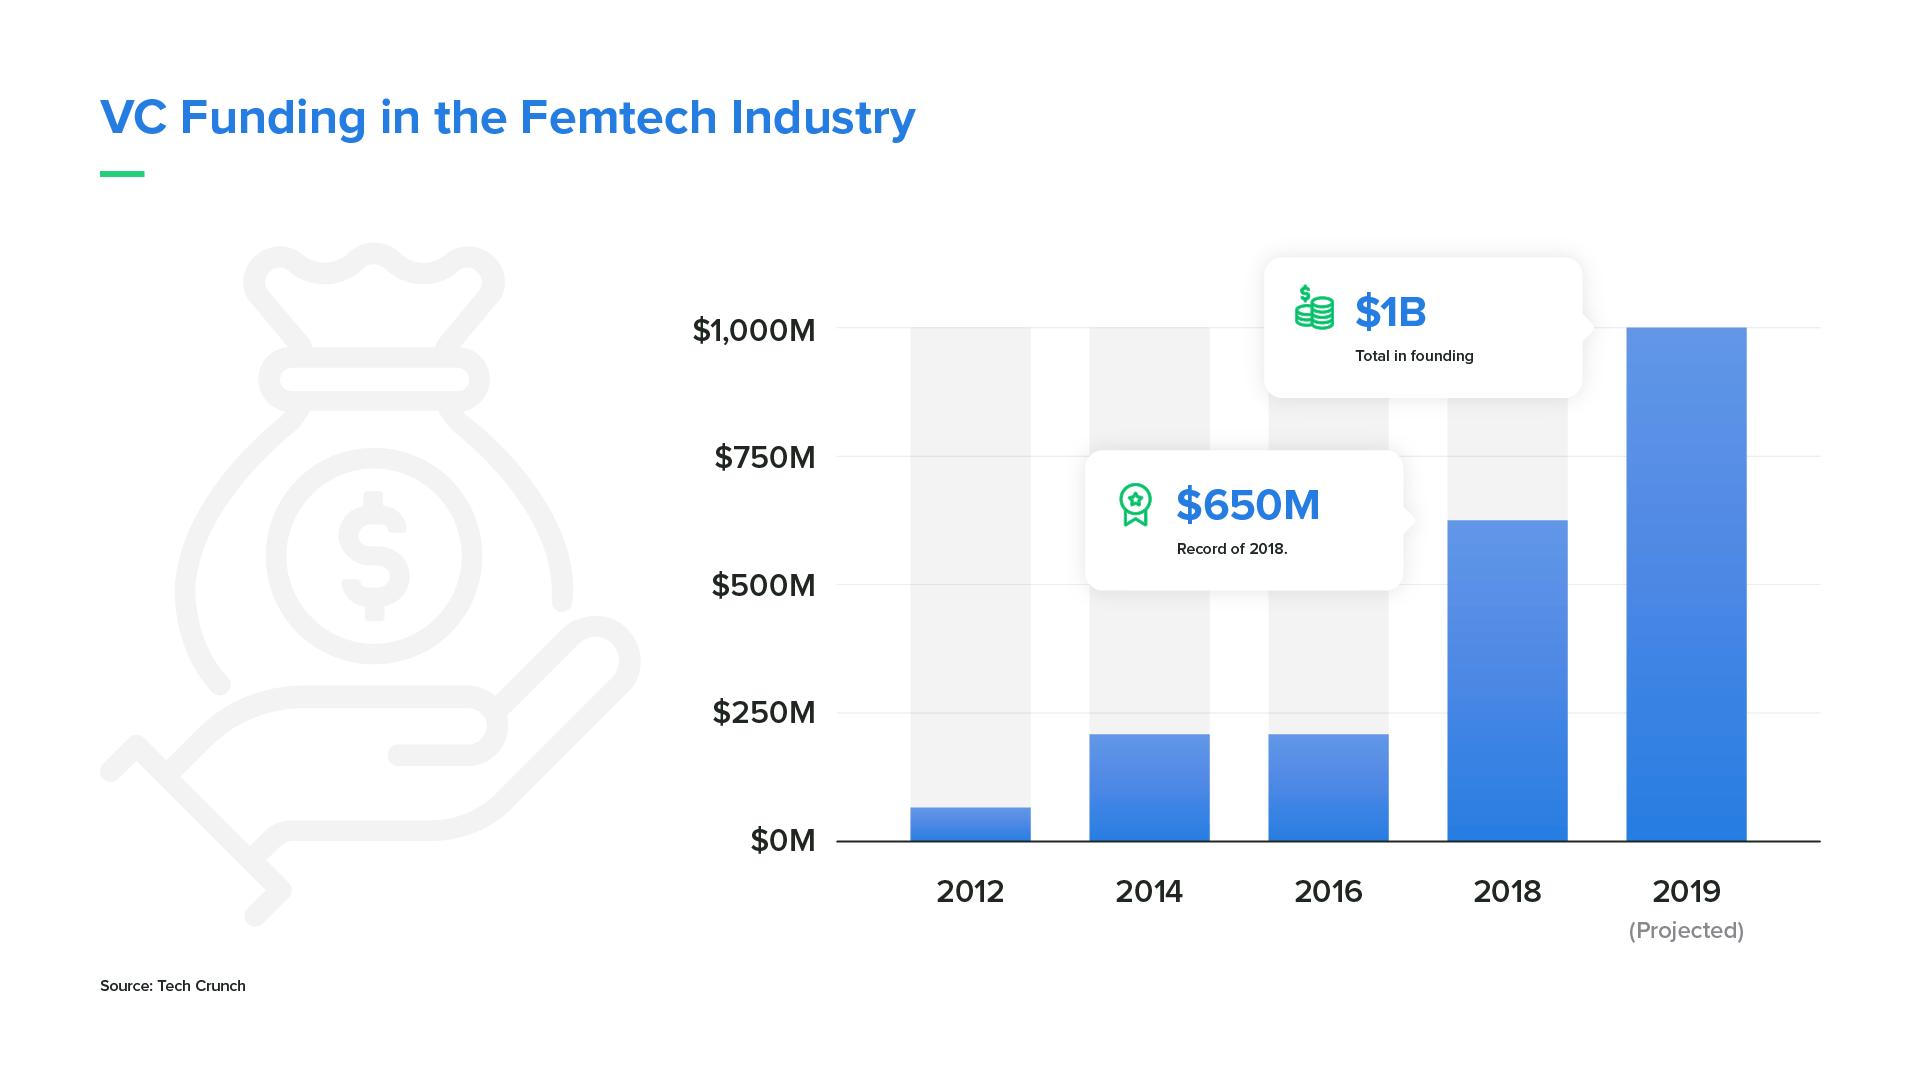 Venture Capital Funding in FemTech